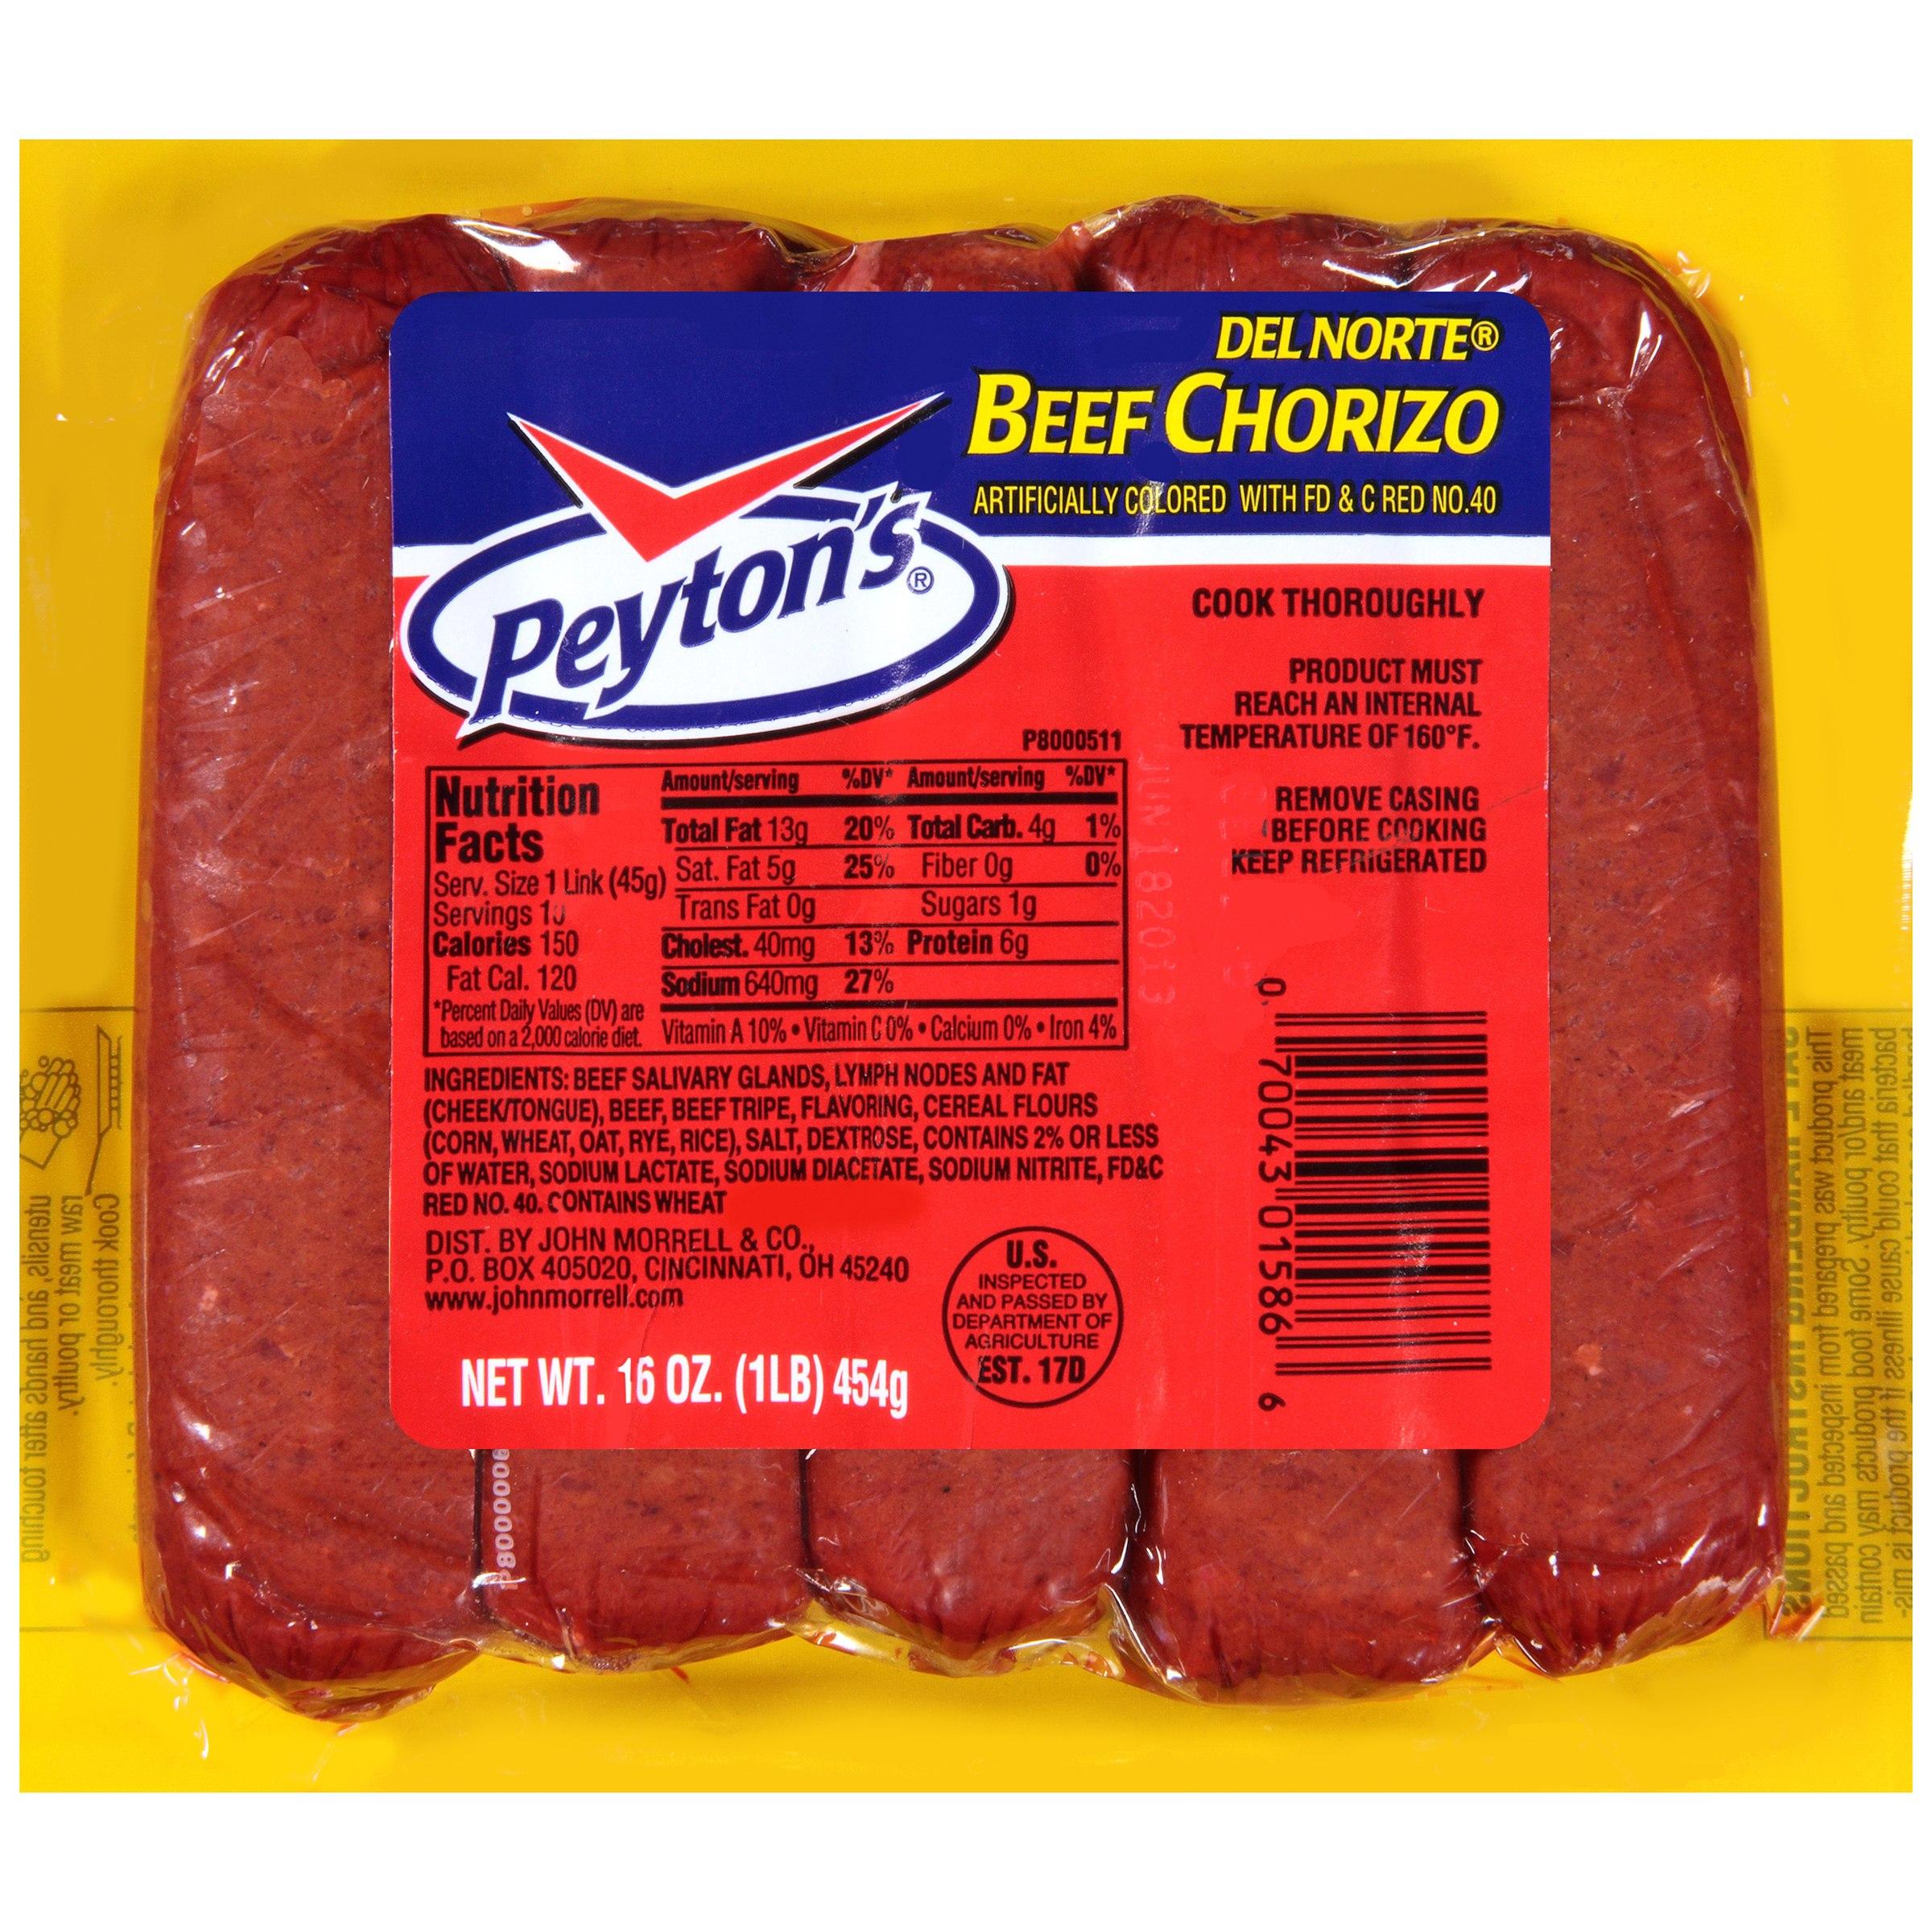 Peyton's Del Norte Beef Chorizo, 16 Oz.